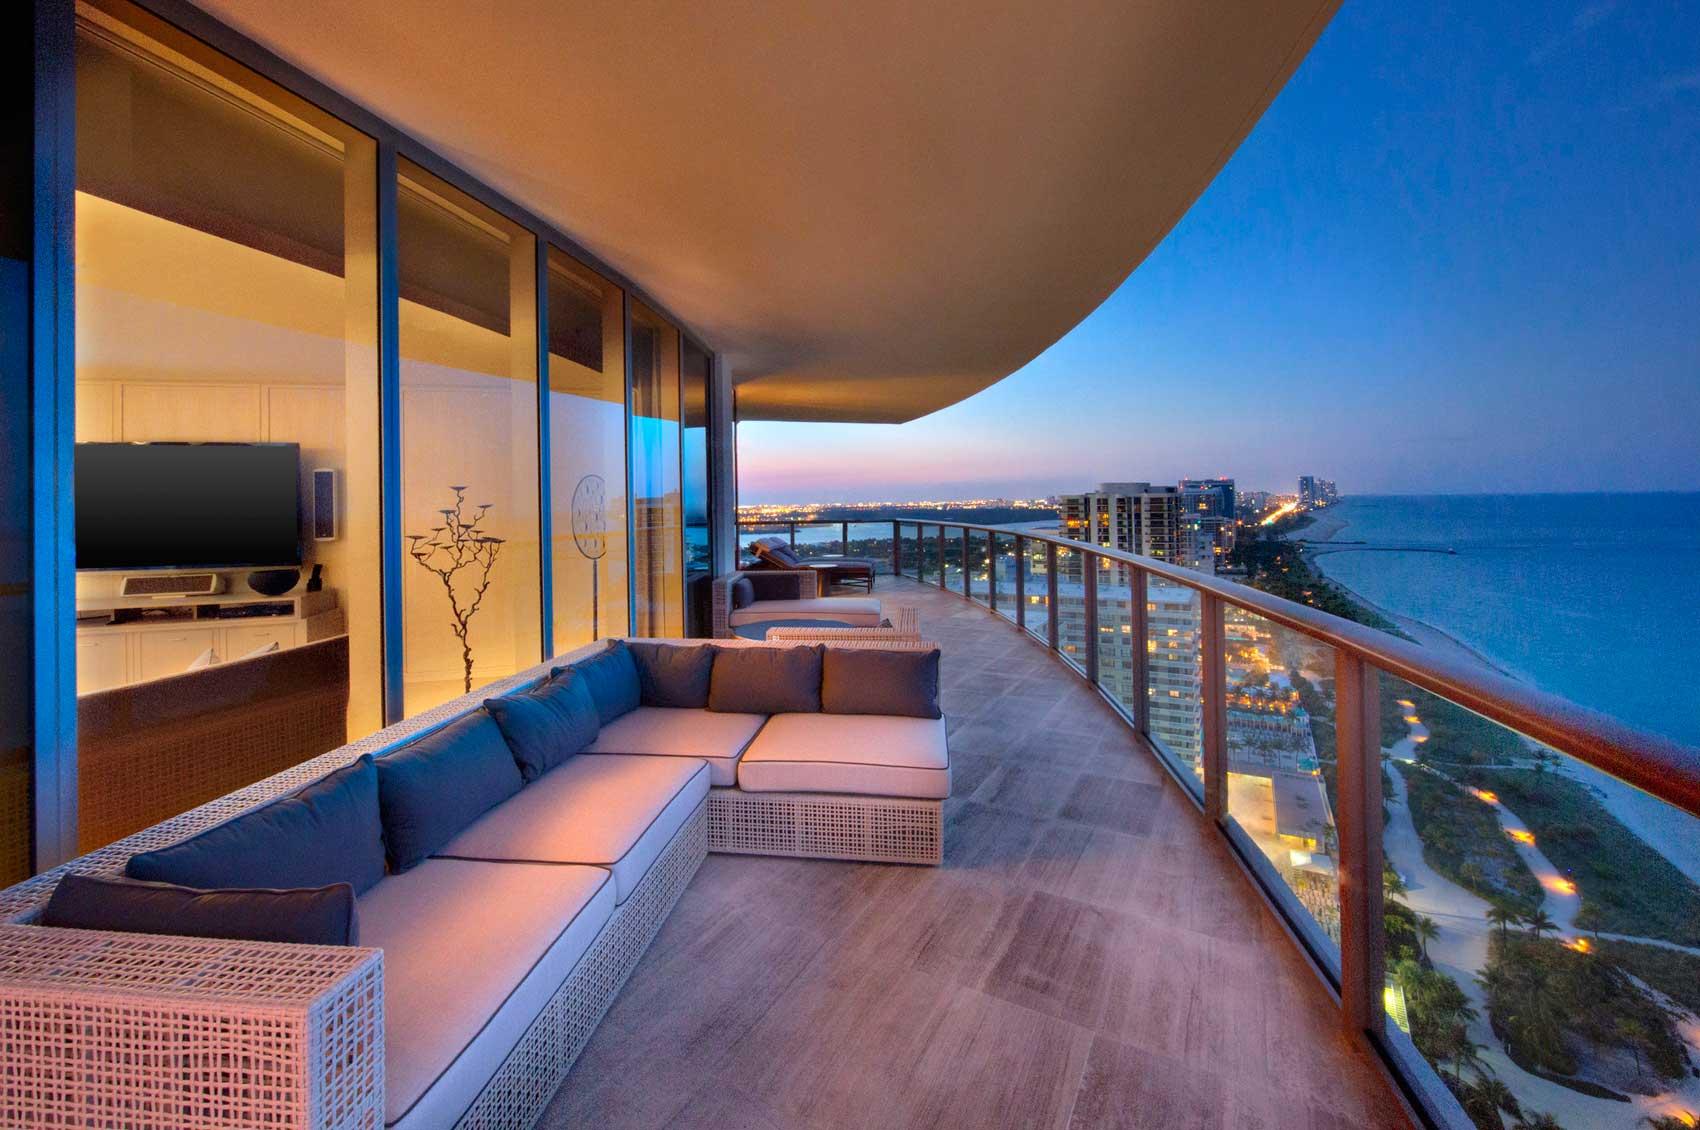 Luxury Travels – Discover Miami luxury travels Luxury Travels – Discover Miami Luxury Travels Discover Miami 9